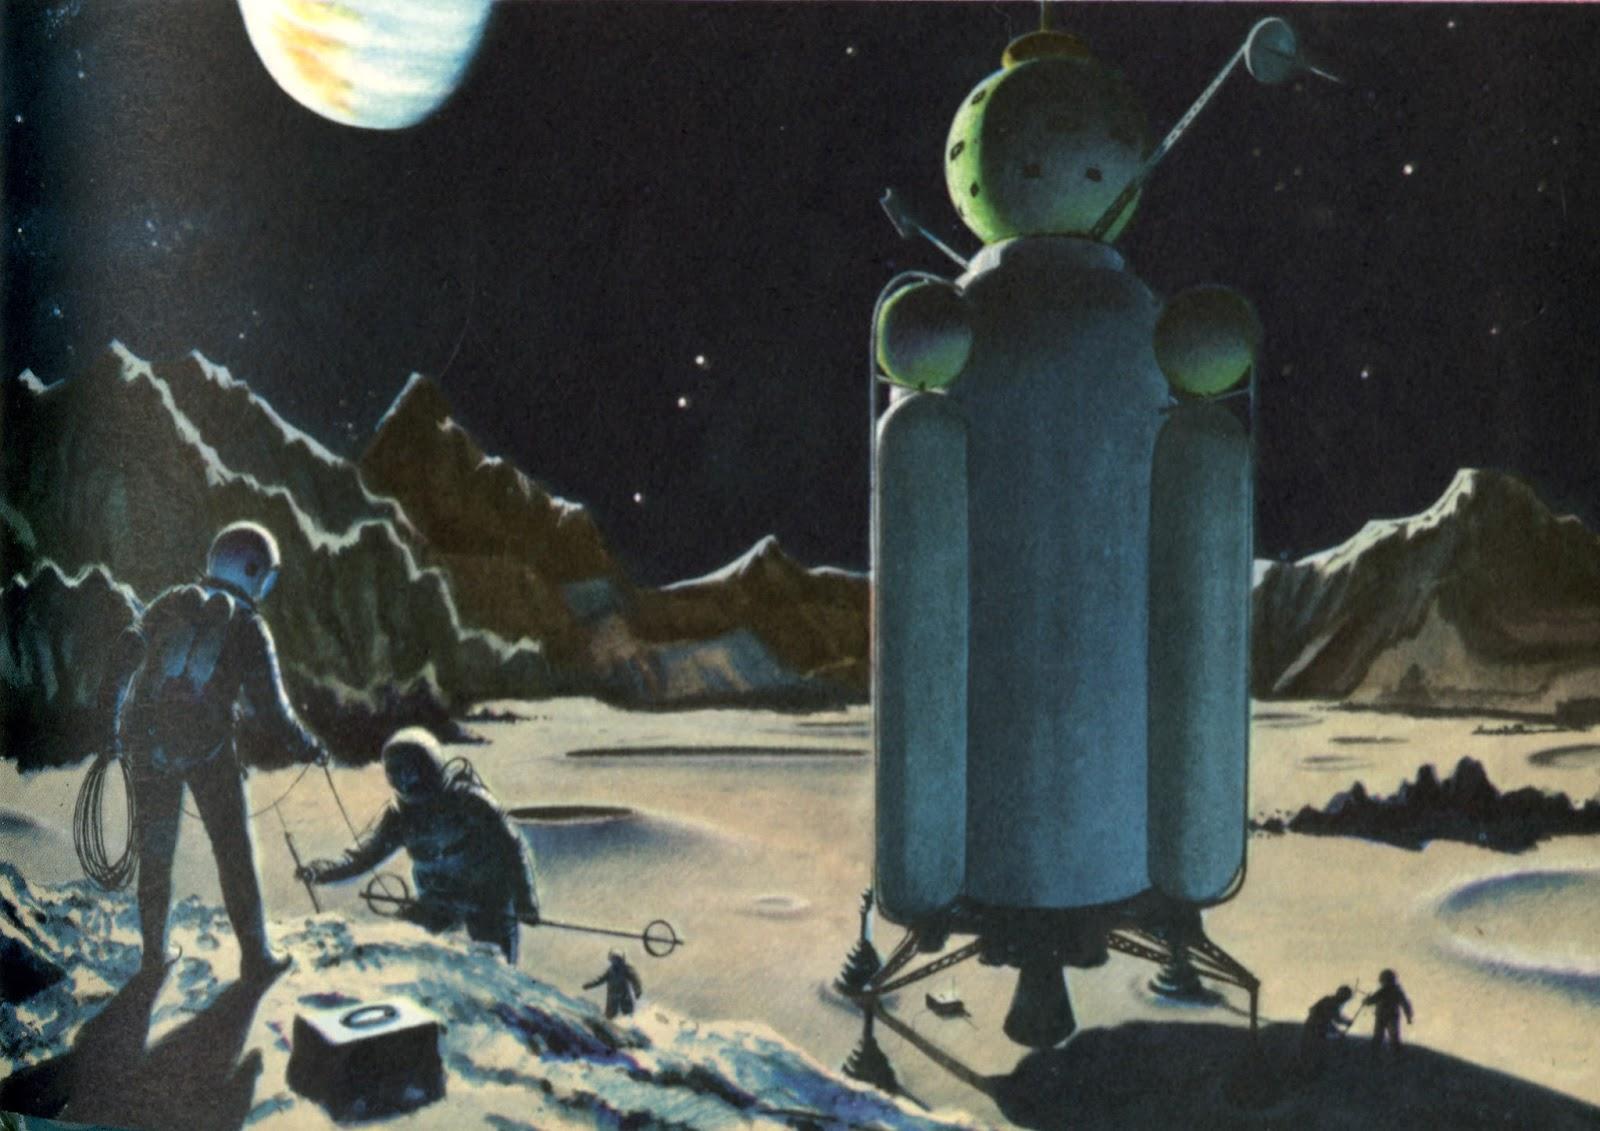 1958 space exploration - photo #3